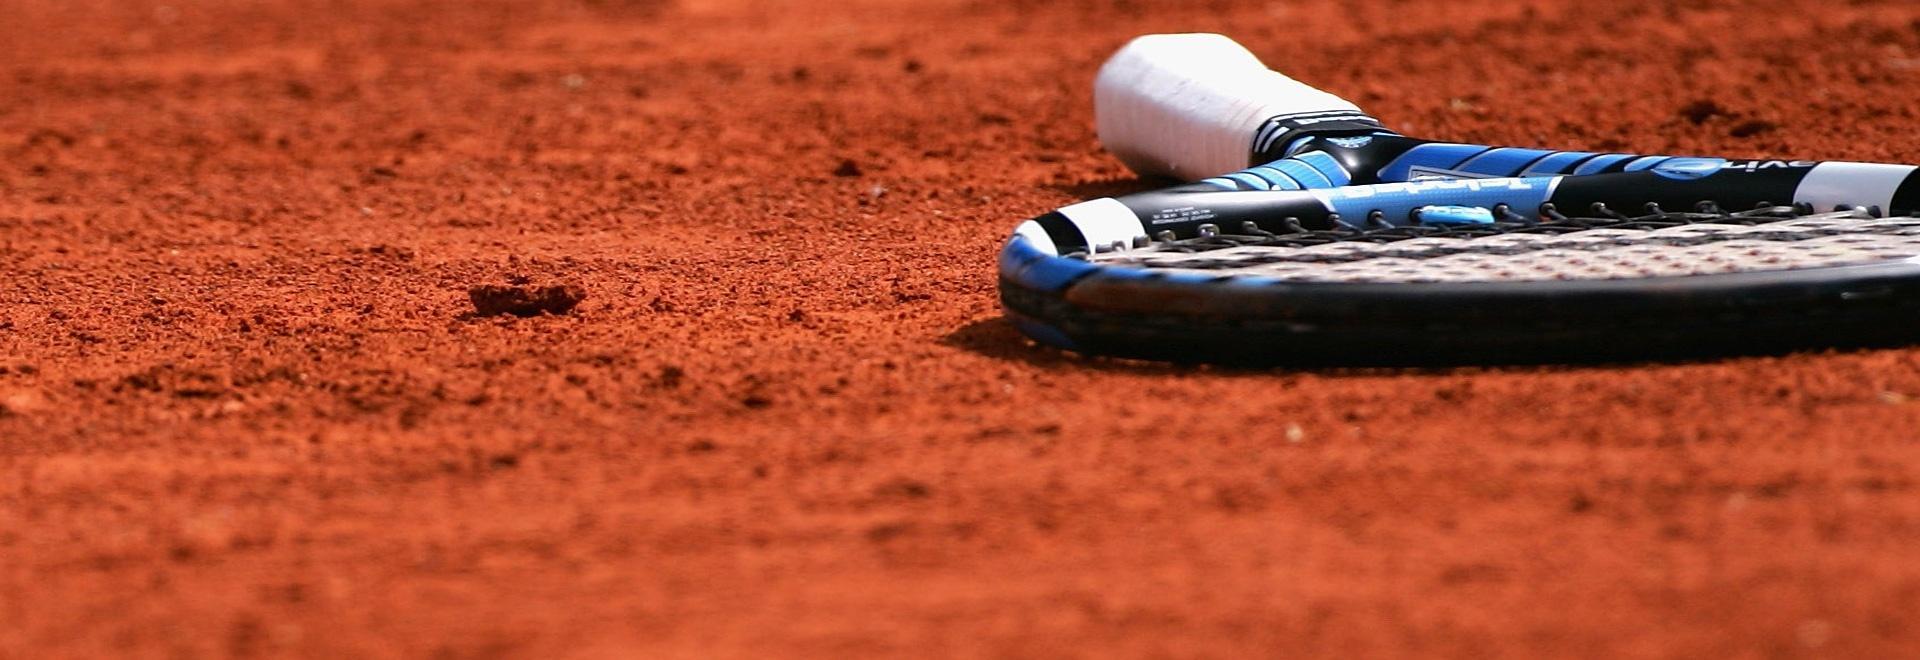 ATP World Tour Masters 1000 HL